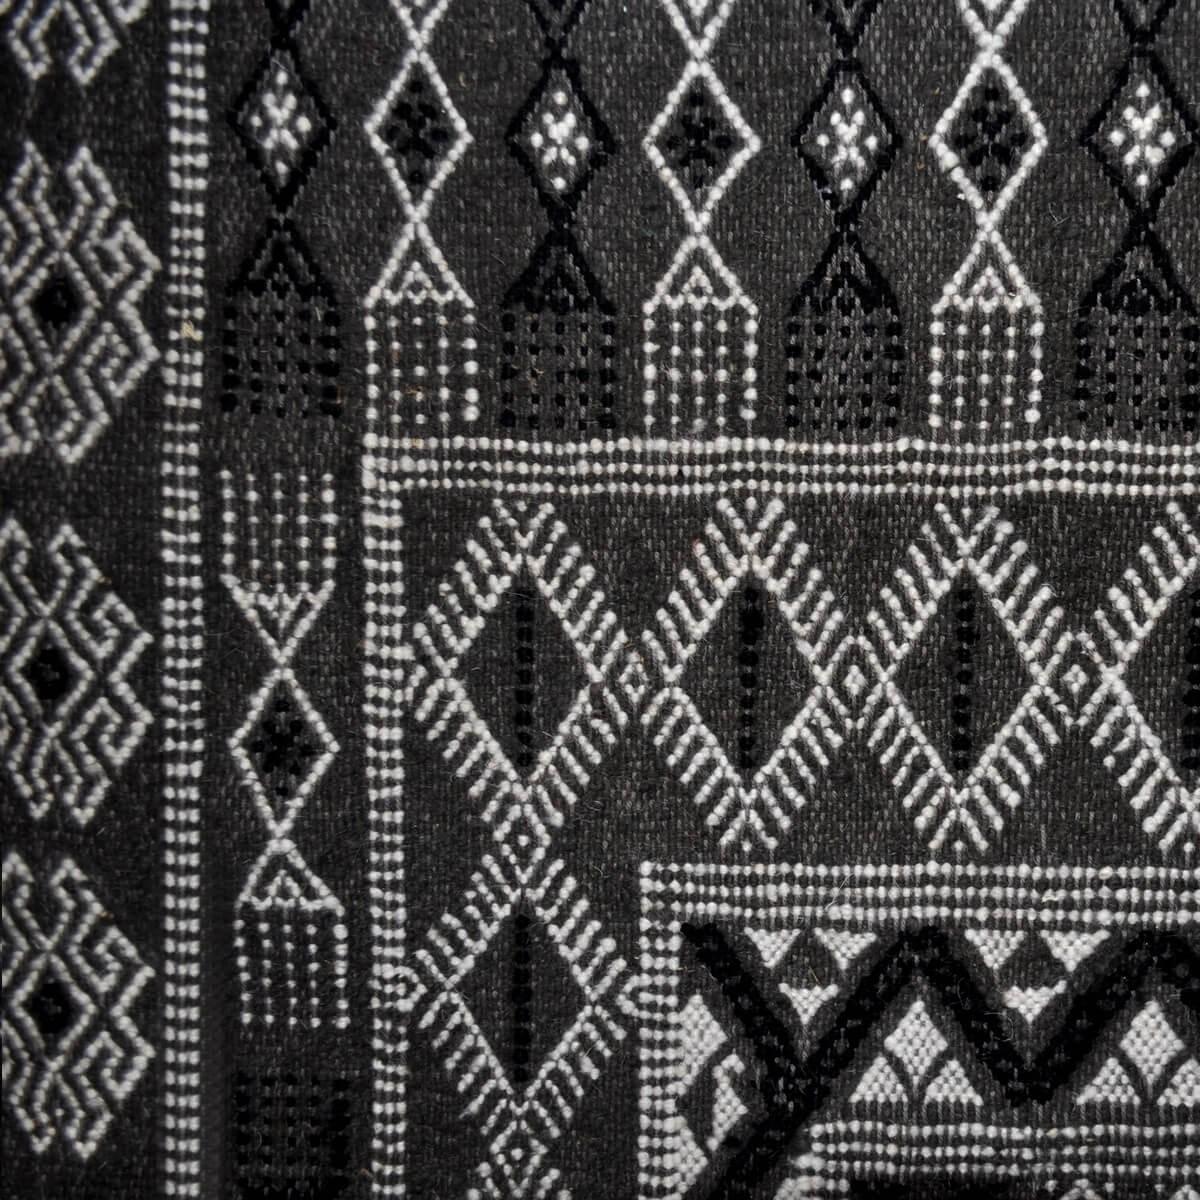 tapis kesra margoum tunisien sajada. Black Bedroom Furniture Sets. Home Design Ideas